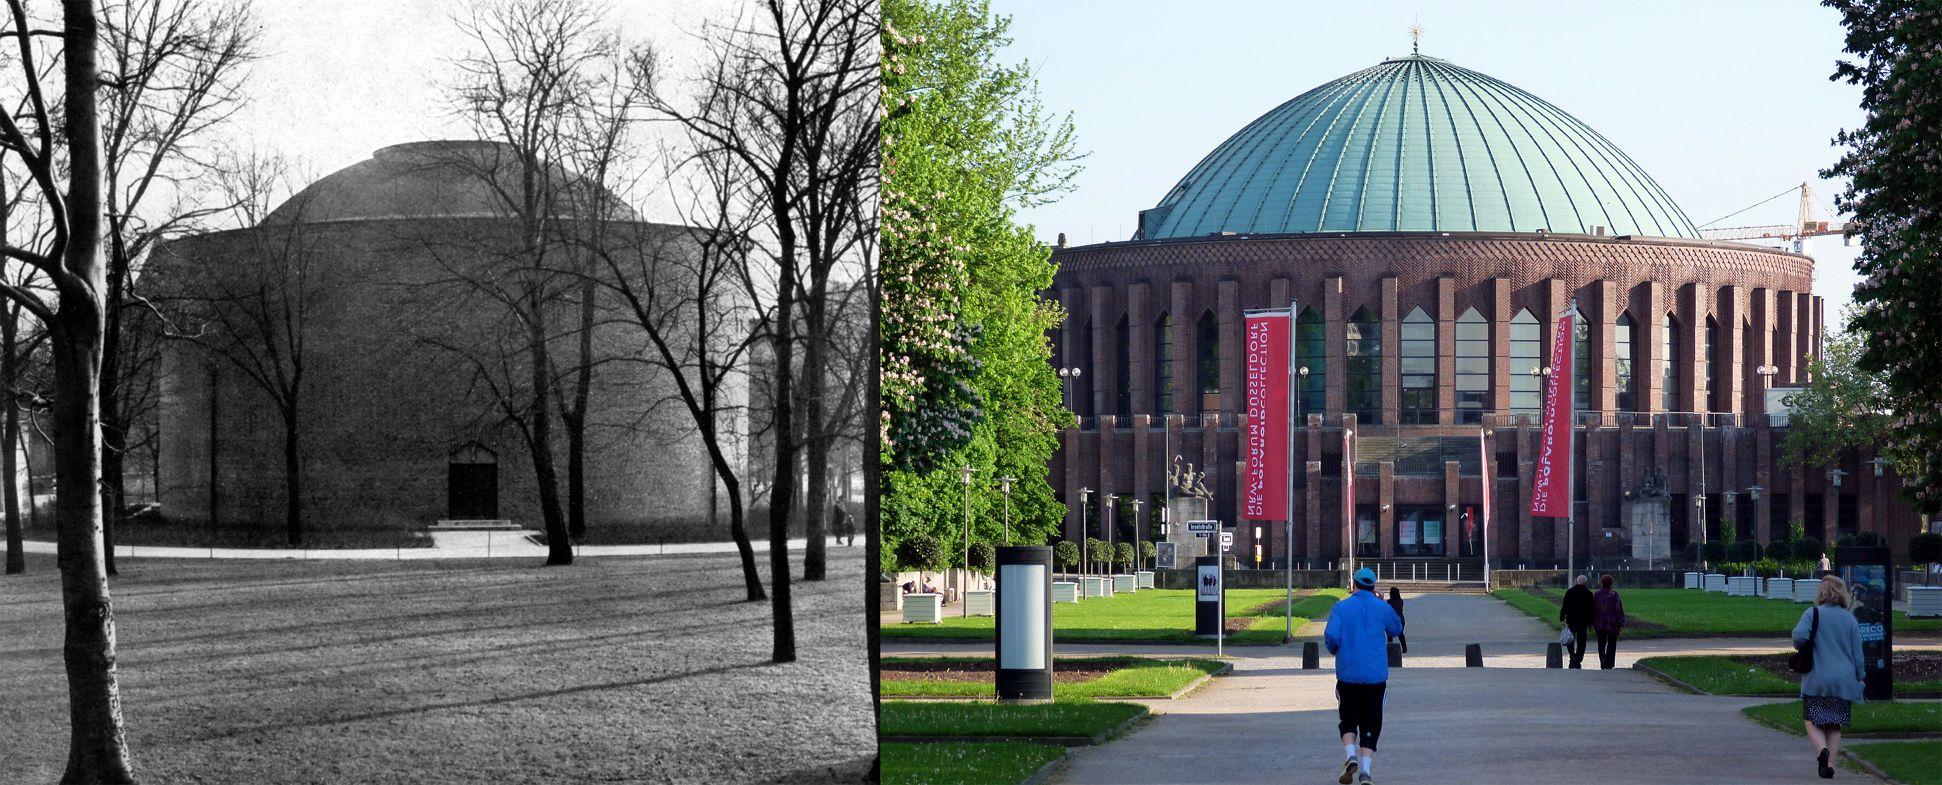 Planetarium EXAMPLE FOR COMPARISON: Düsseldorf, Tonhalle, architect: Wilhelm Kreis , view from Museum Kunst Palast (Art Palace)